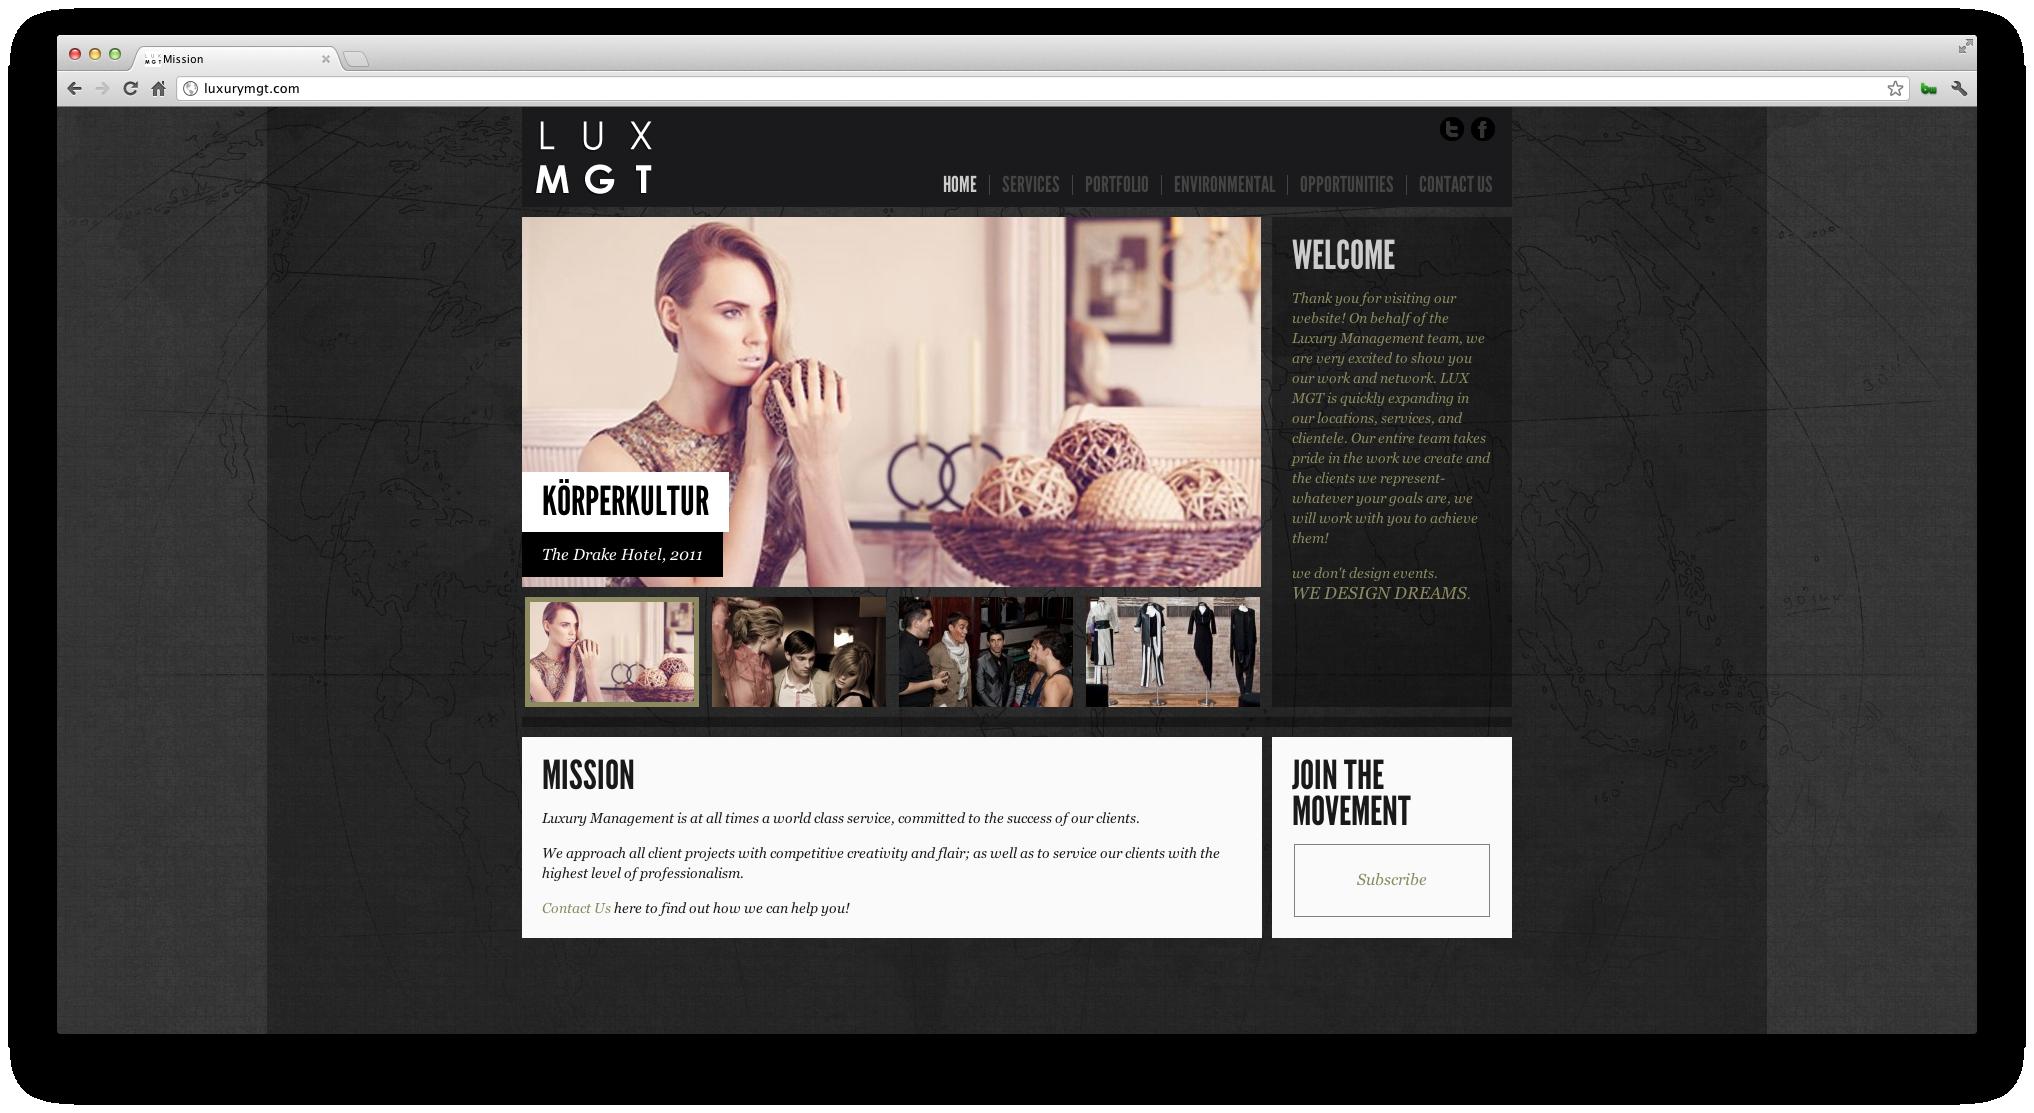 LUX MGT Website